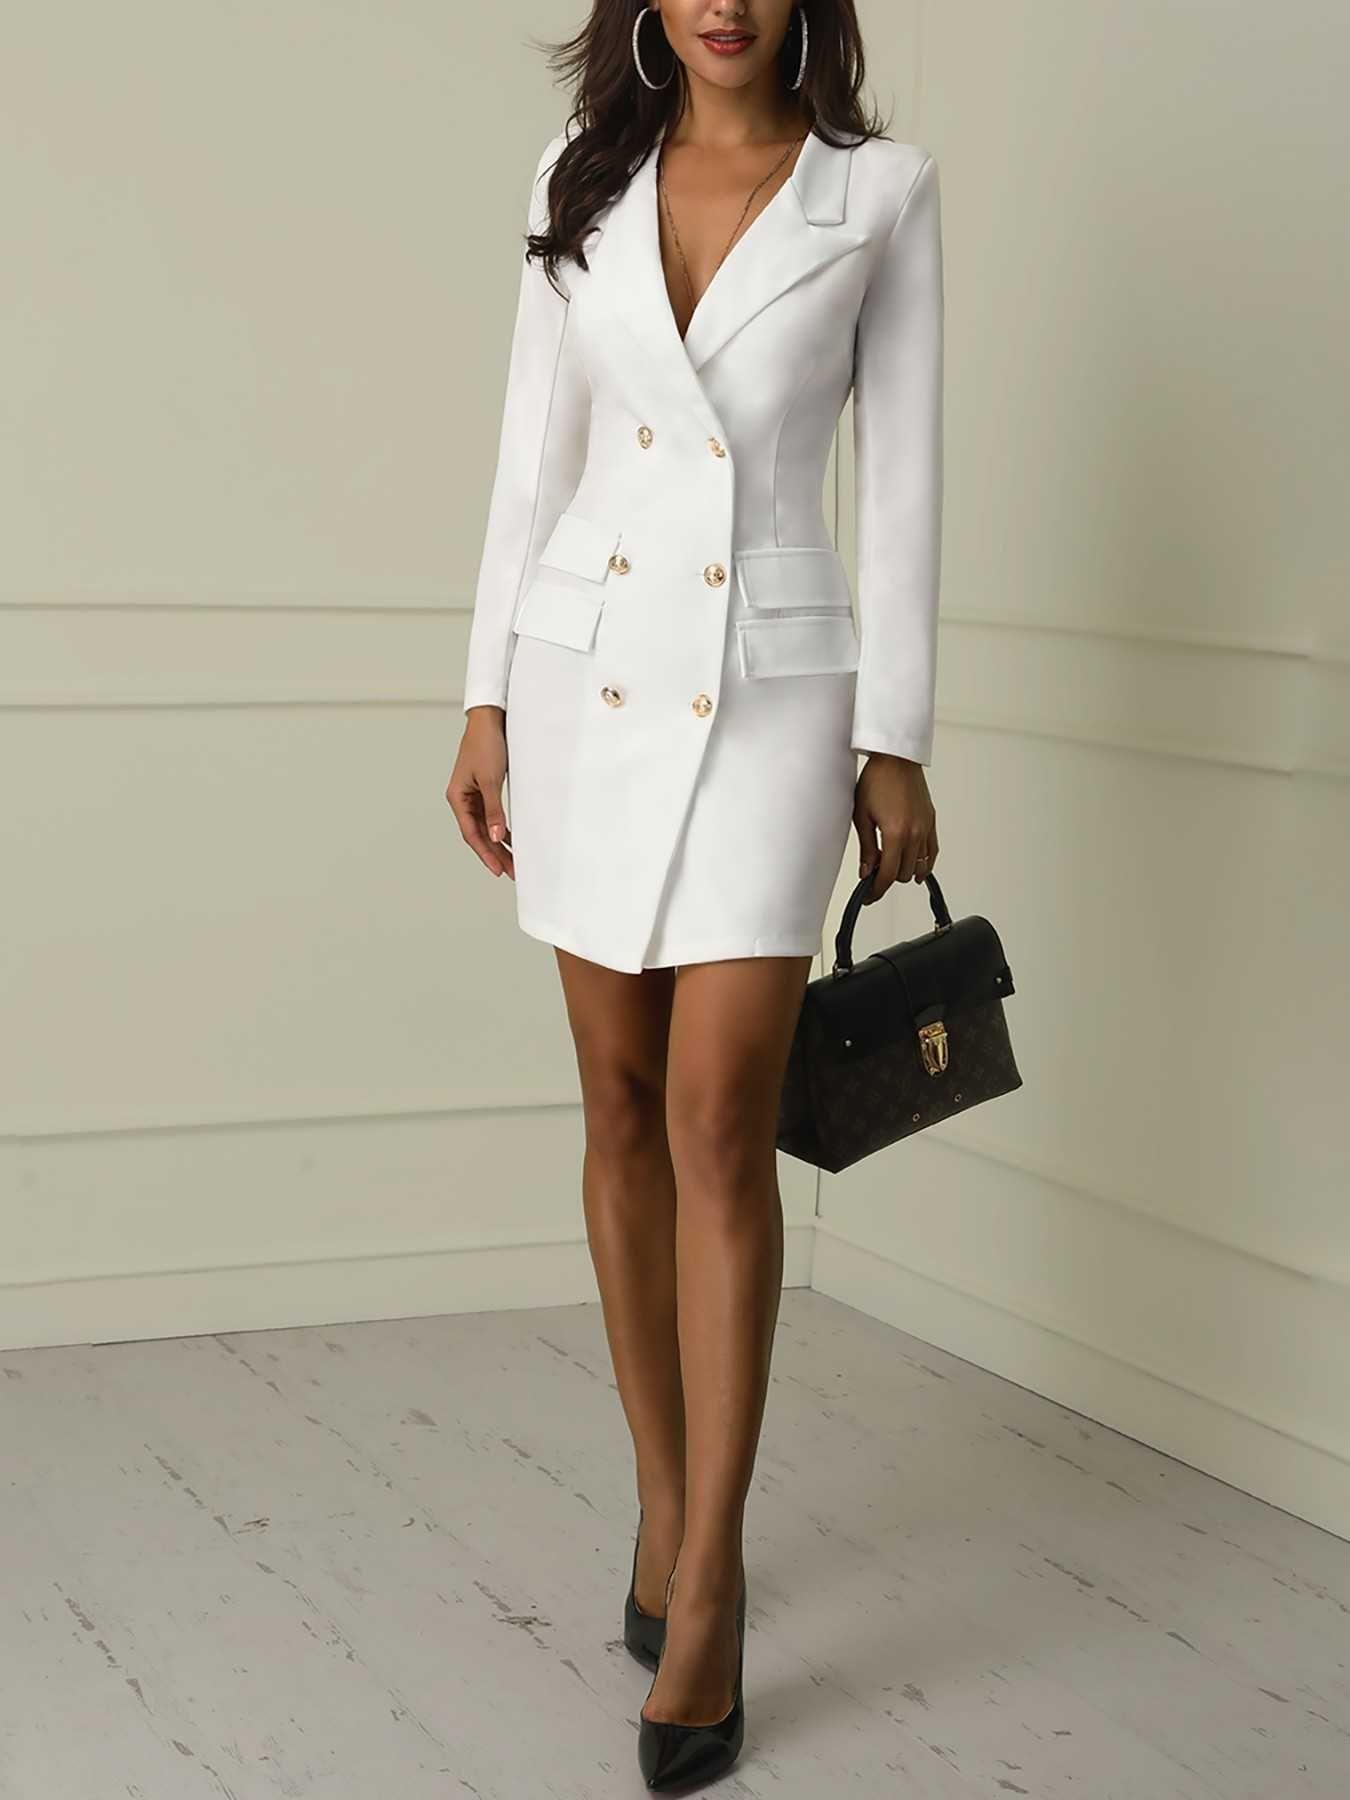 40++ Womens blazer dress ideas in 2021